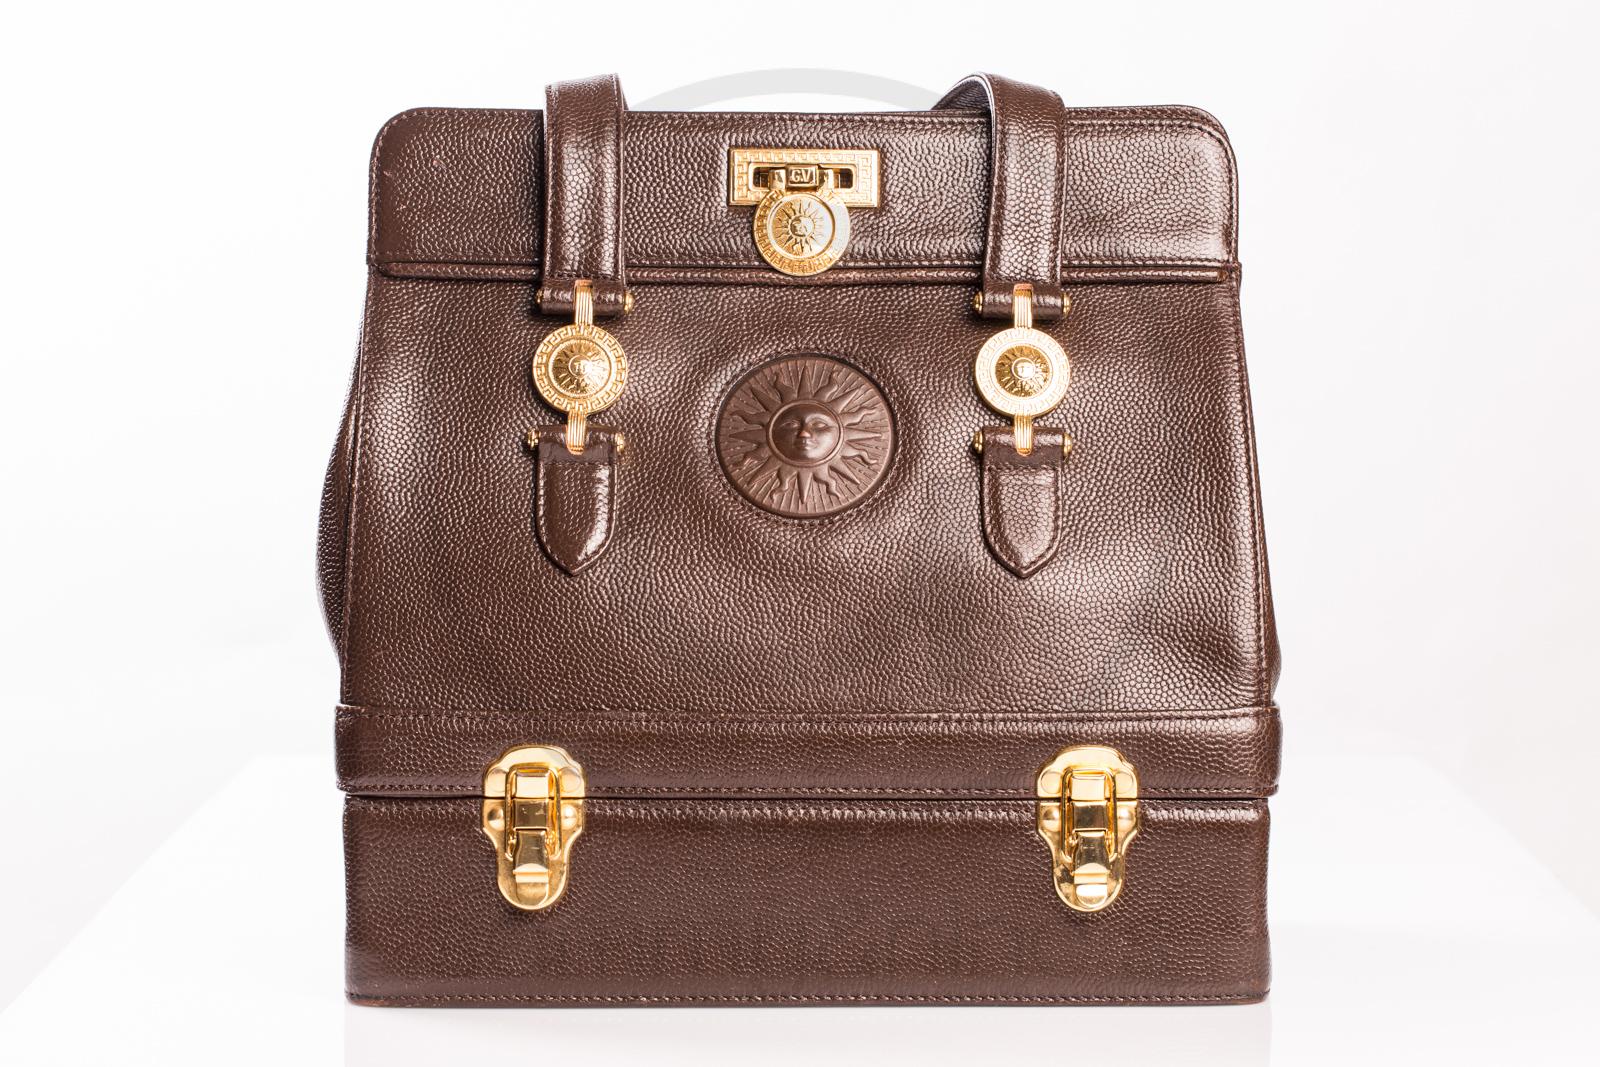 381a4da951 Previous  Next. HomeSOLD OUTGianni Versace purse